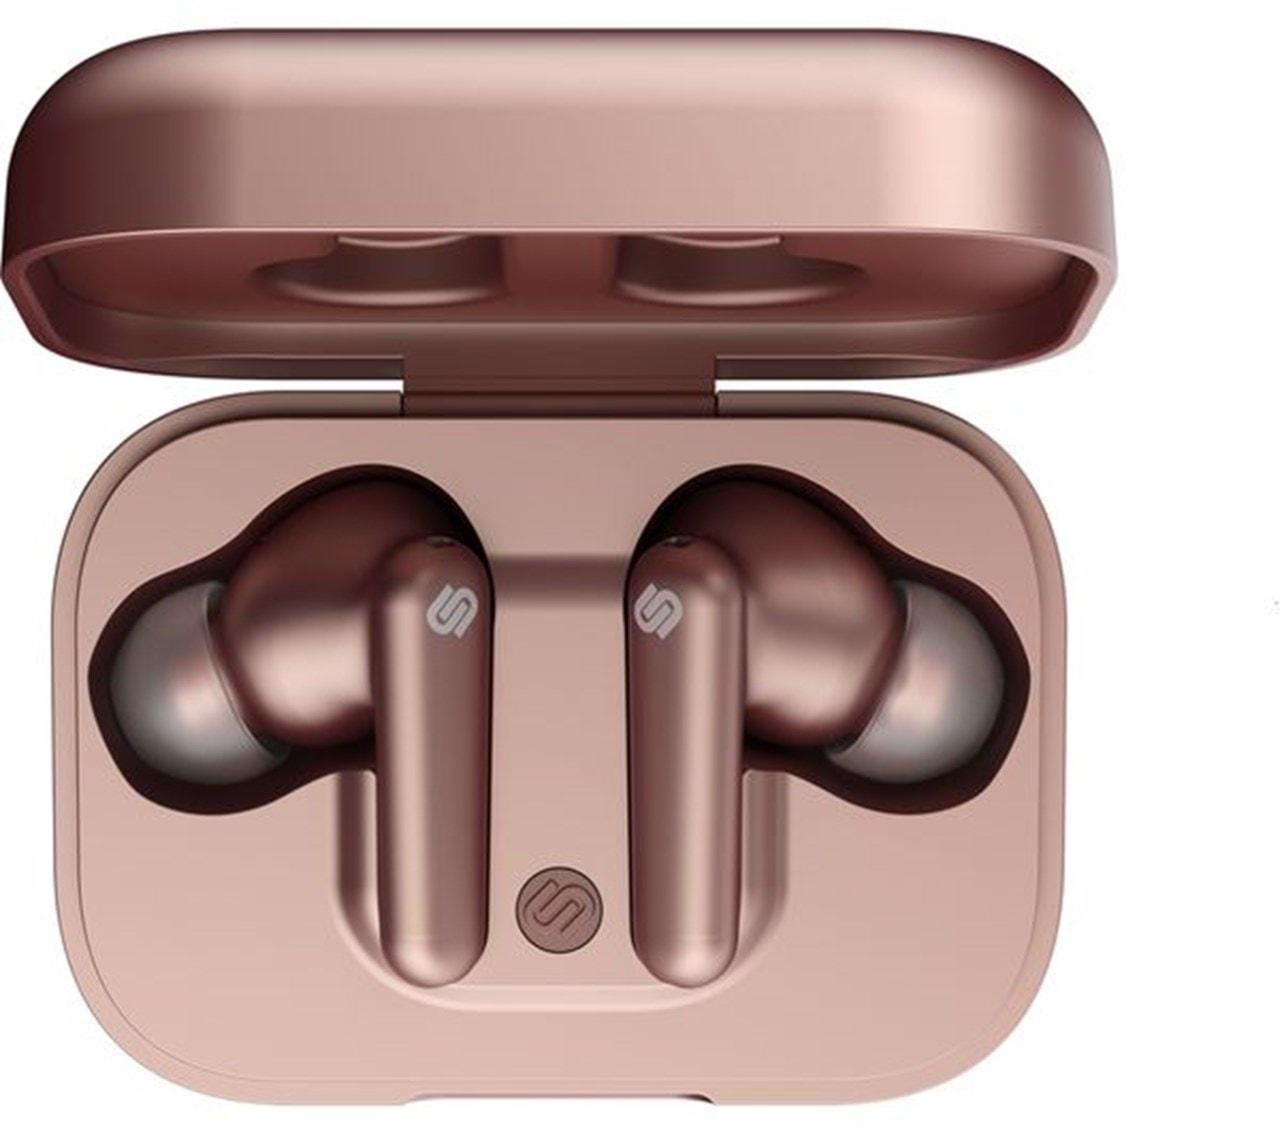 Urbanista London Rose Gold True Wireless Active Noise Cancelling Bluetooth Earphones - 4